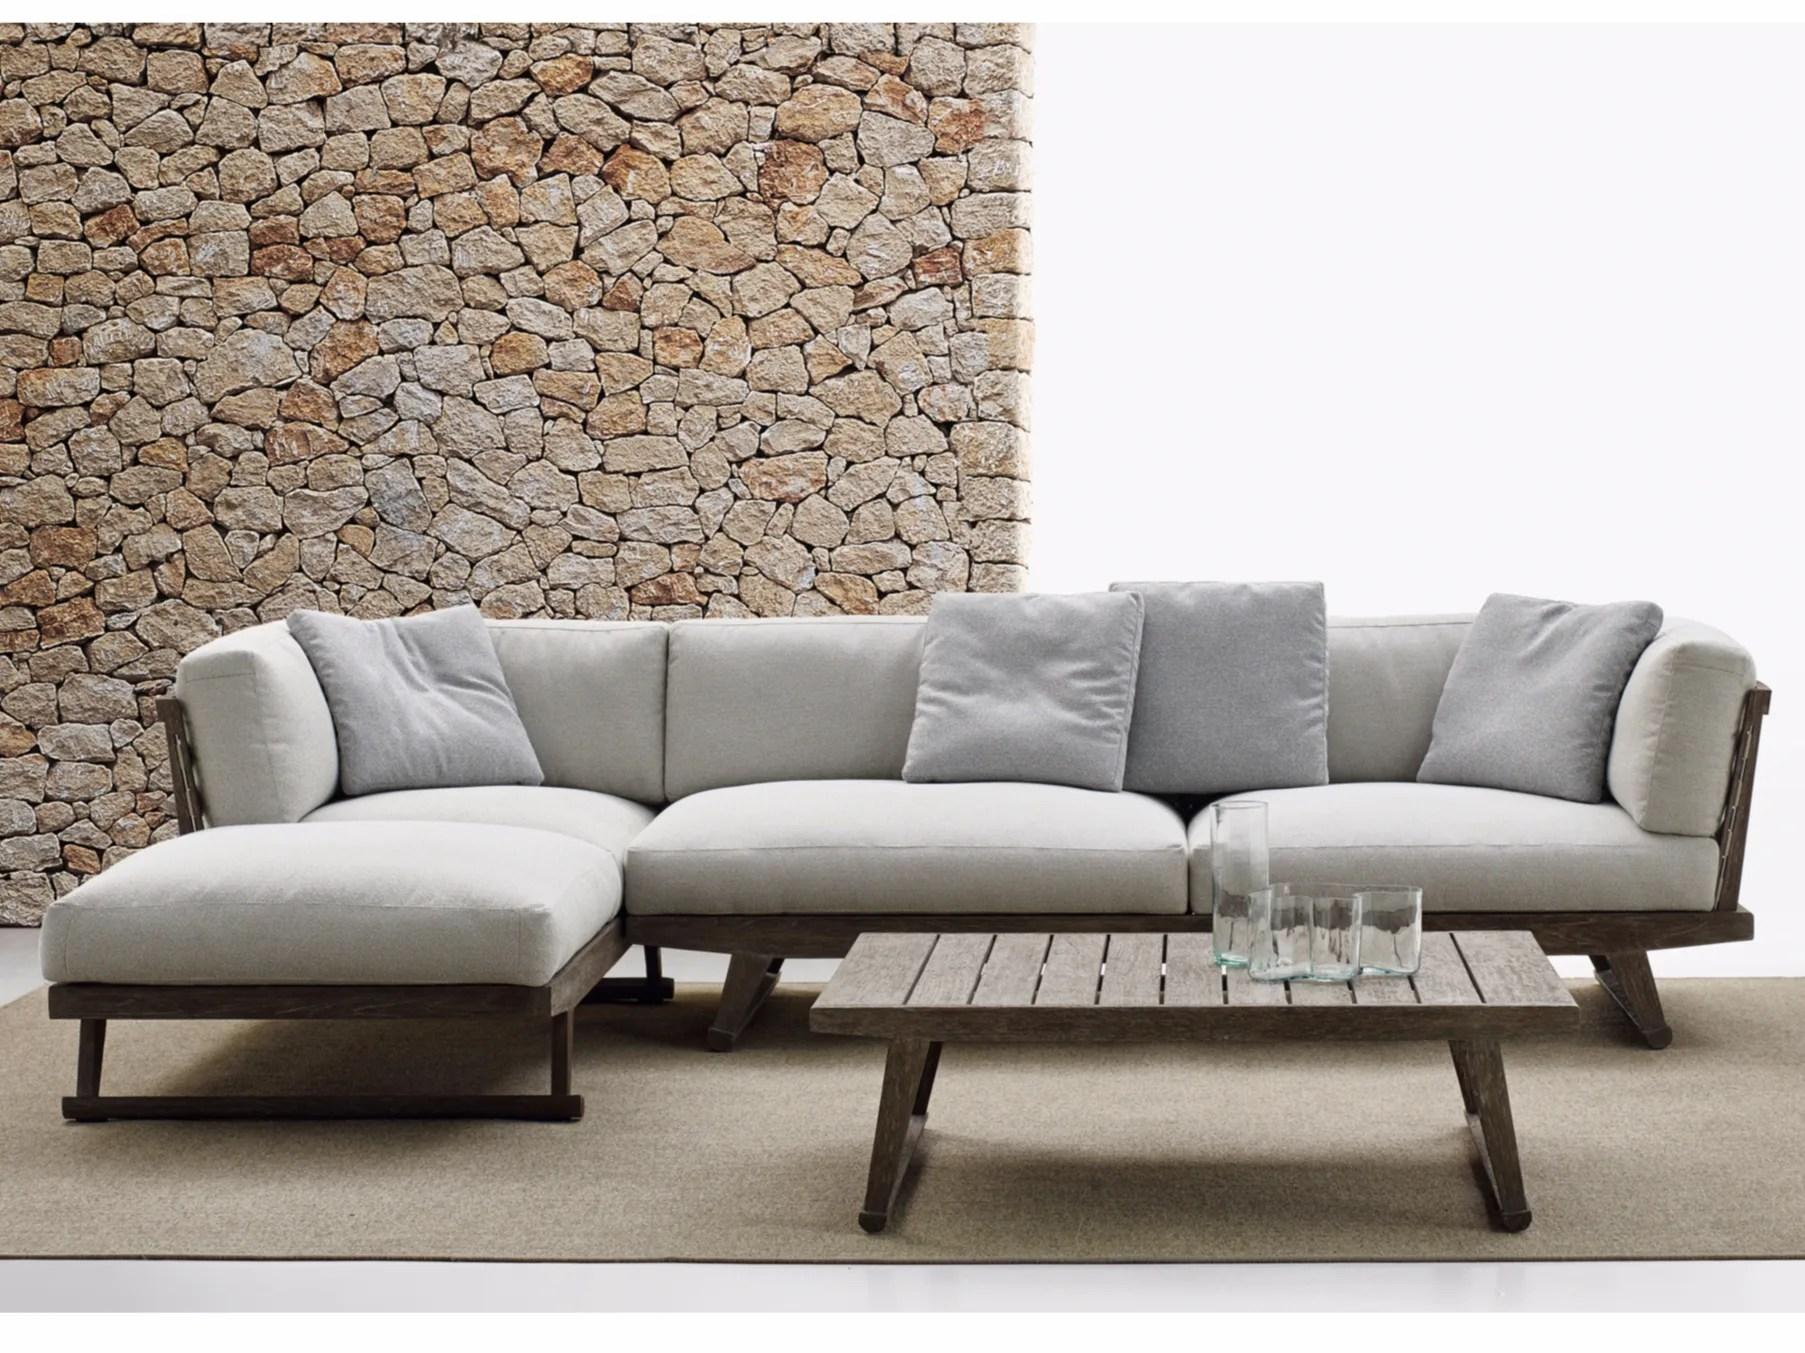 GIO Sofa With Chaise Longue Gio Collection By B&B Italia